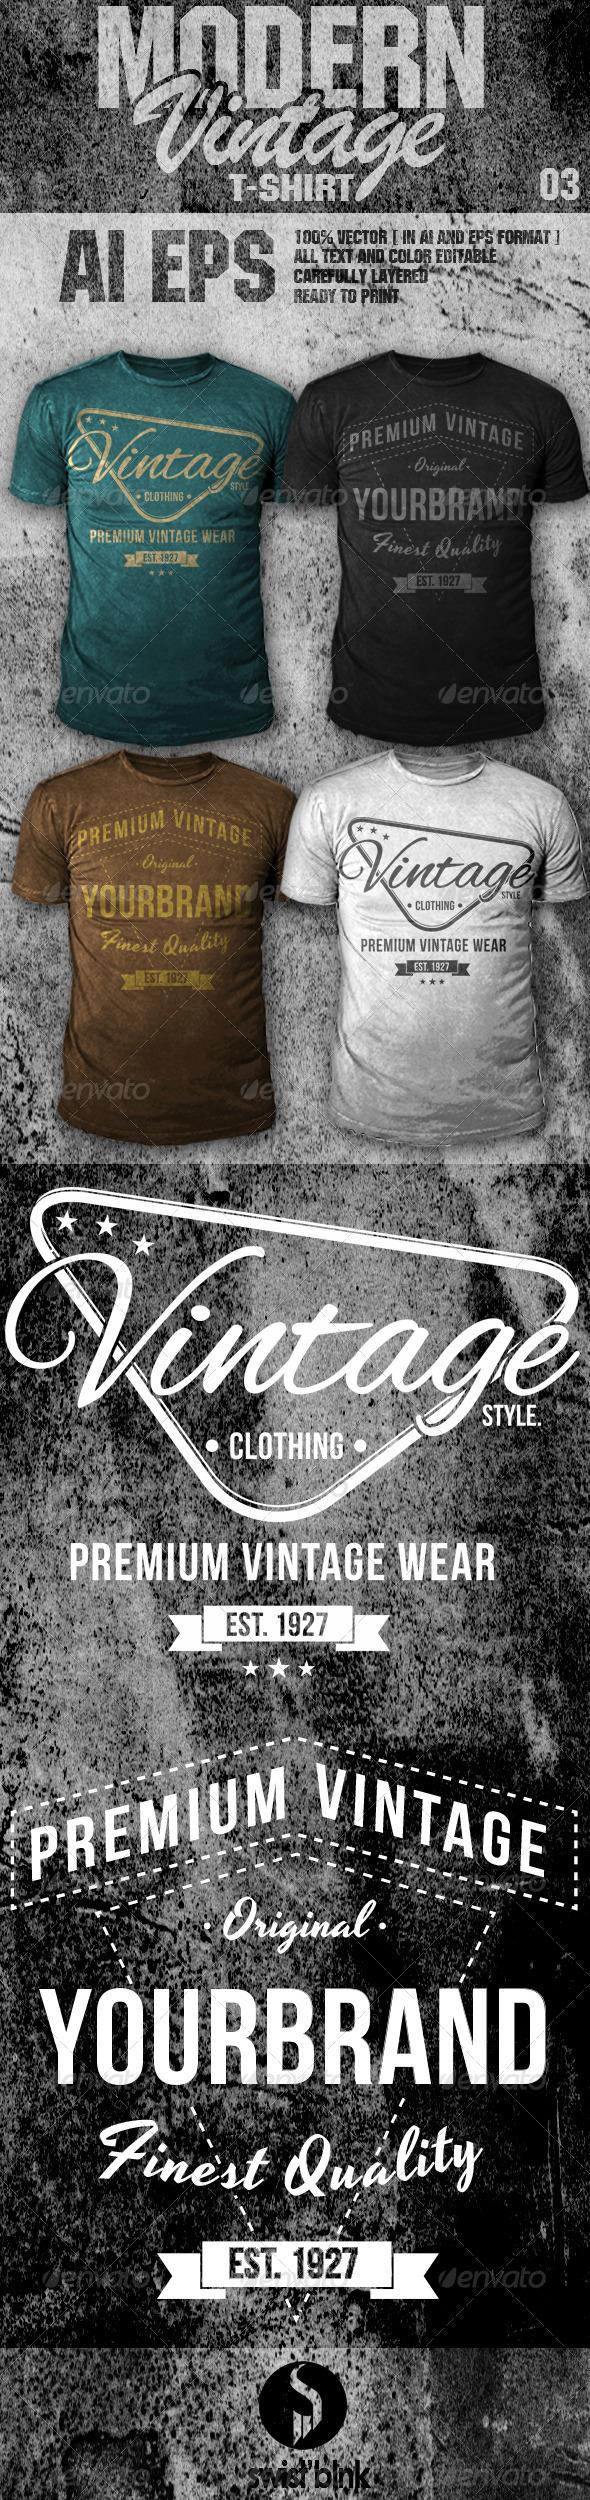 GraphicRiver Modern Vintage T-Shirt 03 6655954